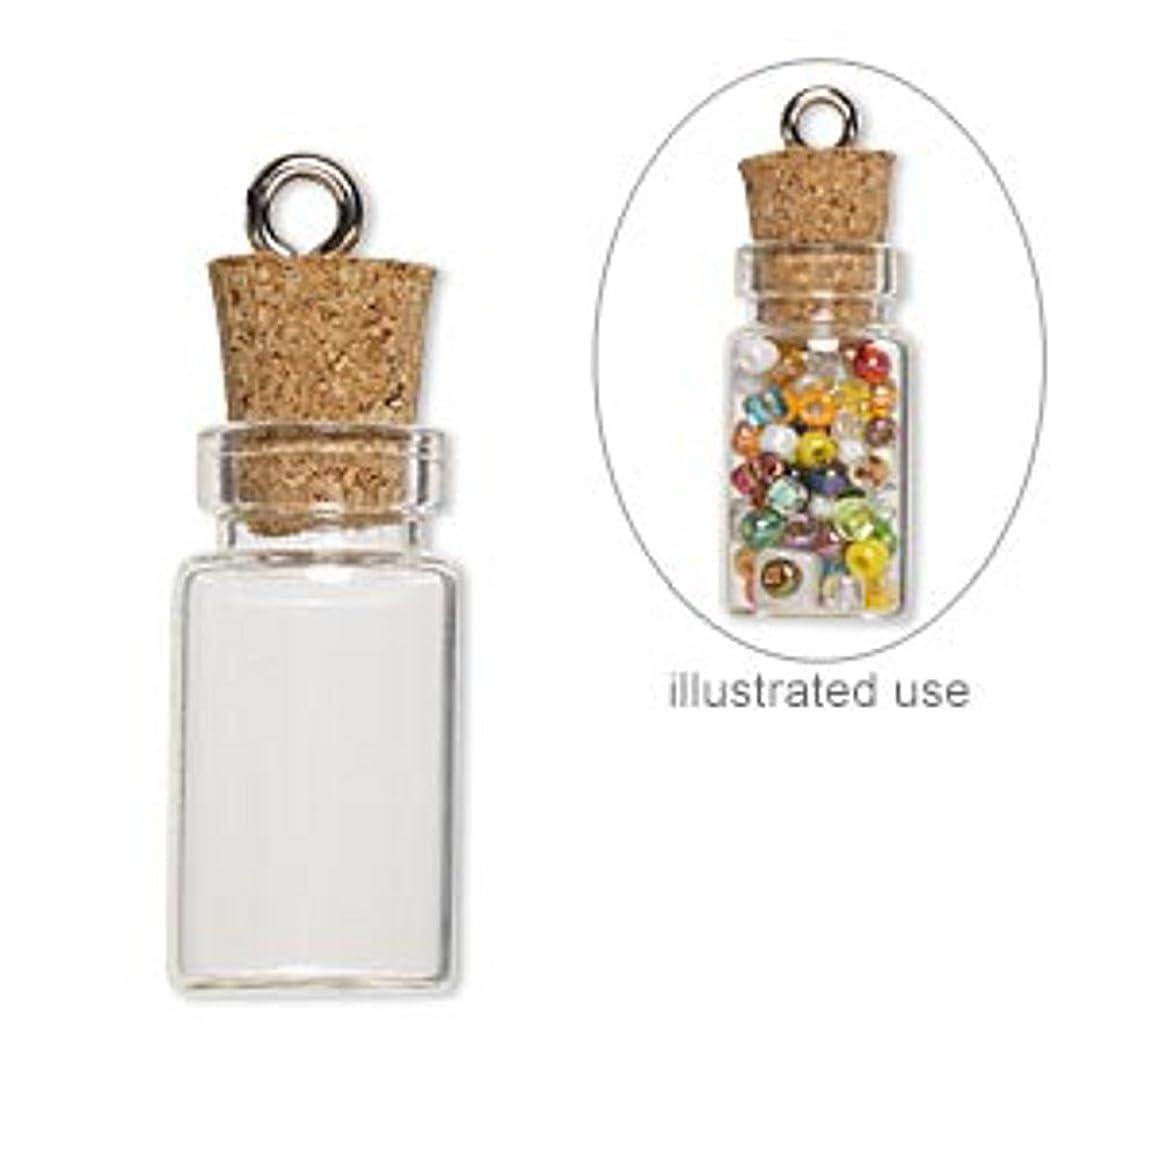 20 Mini Glass Bottles 1-inch Message Treasure Charm Pendant Kit Makes 20 Bottle Pendants